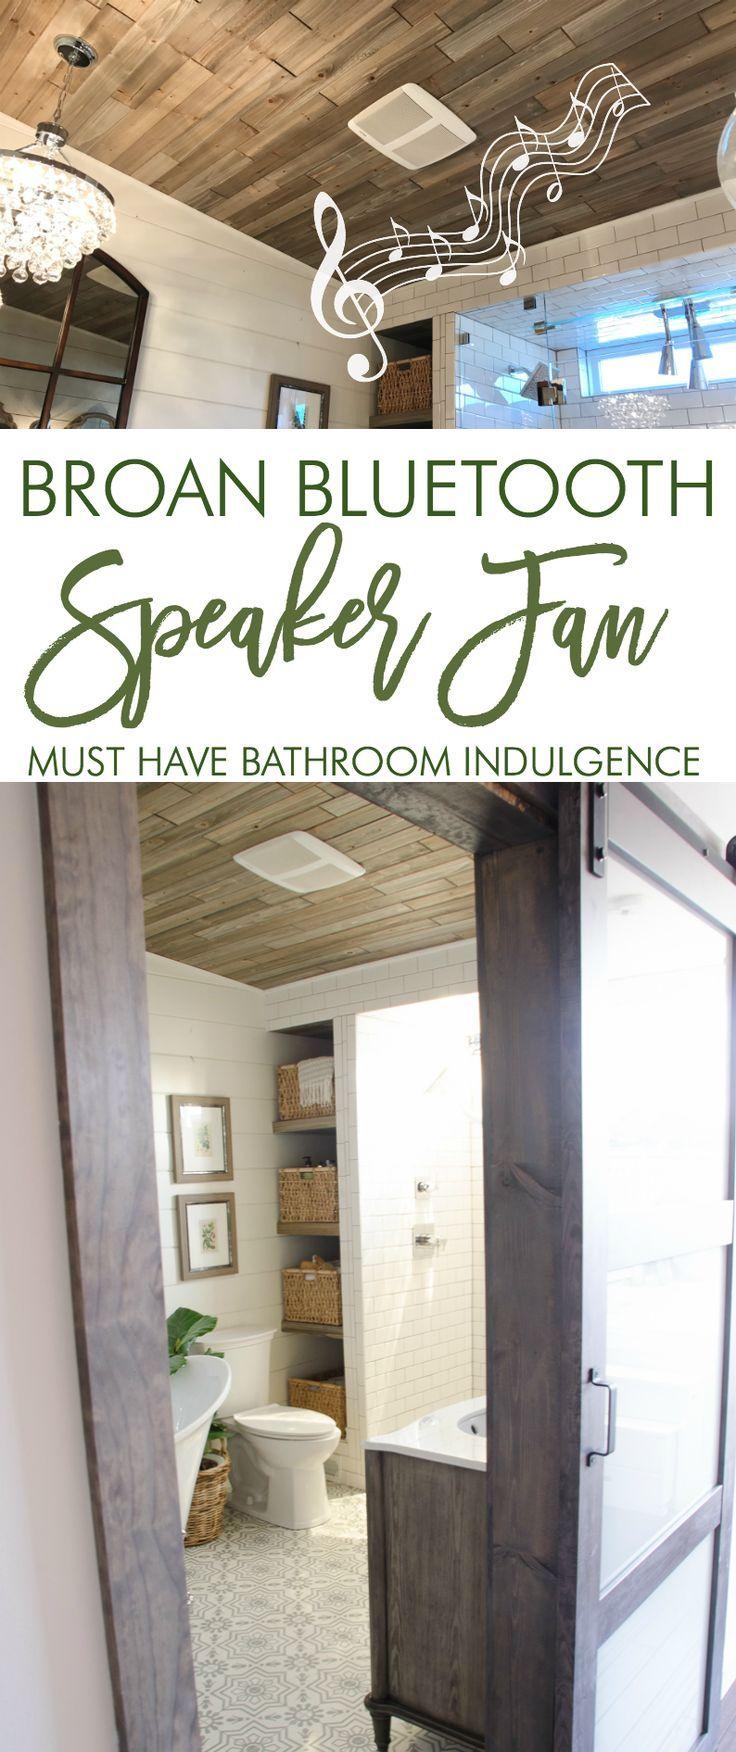 broan sensonic bath fan must have bathroom indulgence bathrooms rh pinterest dk